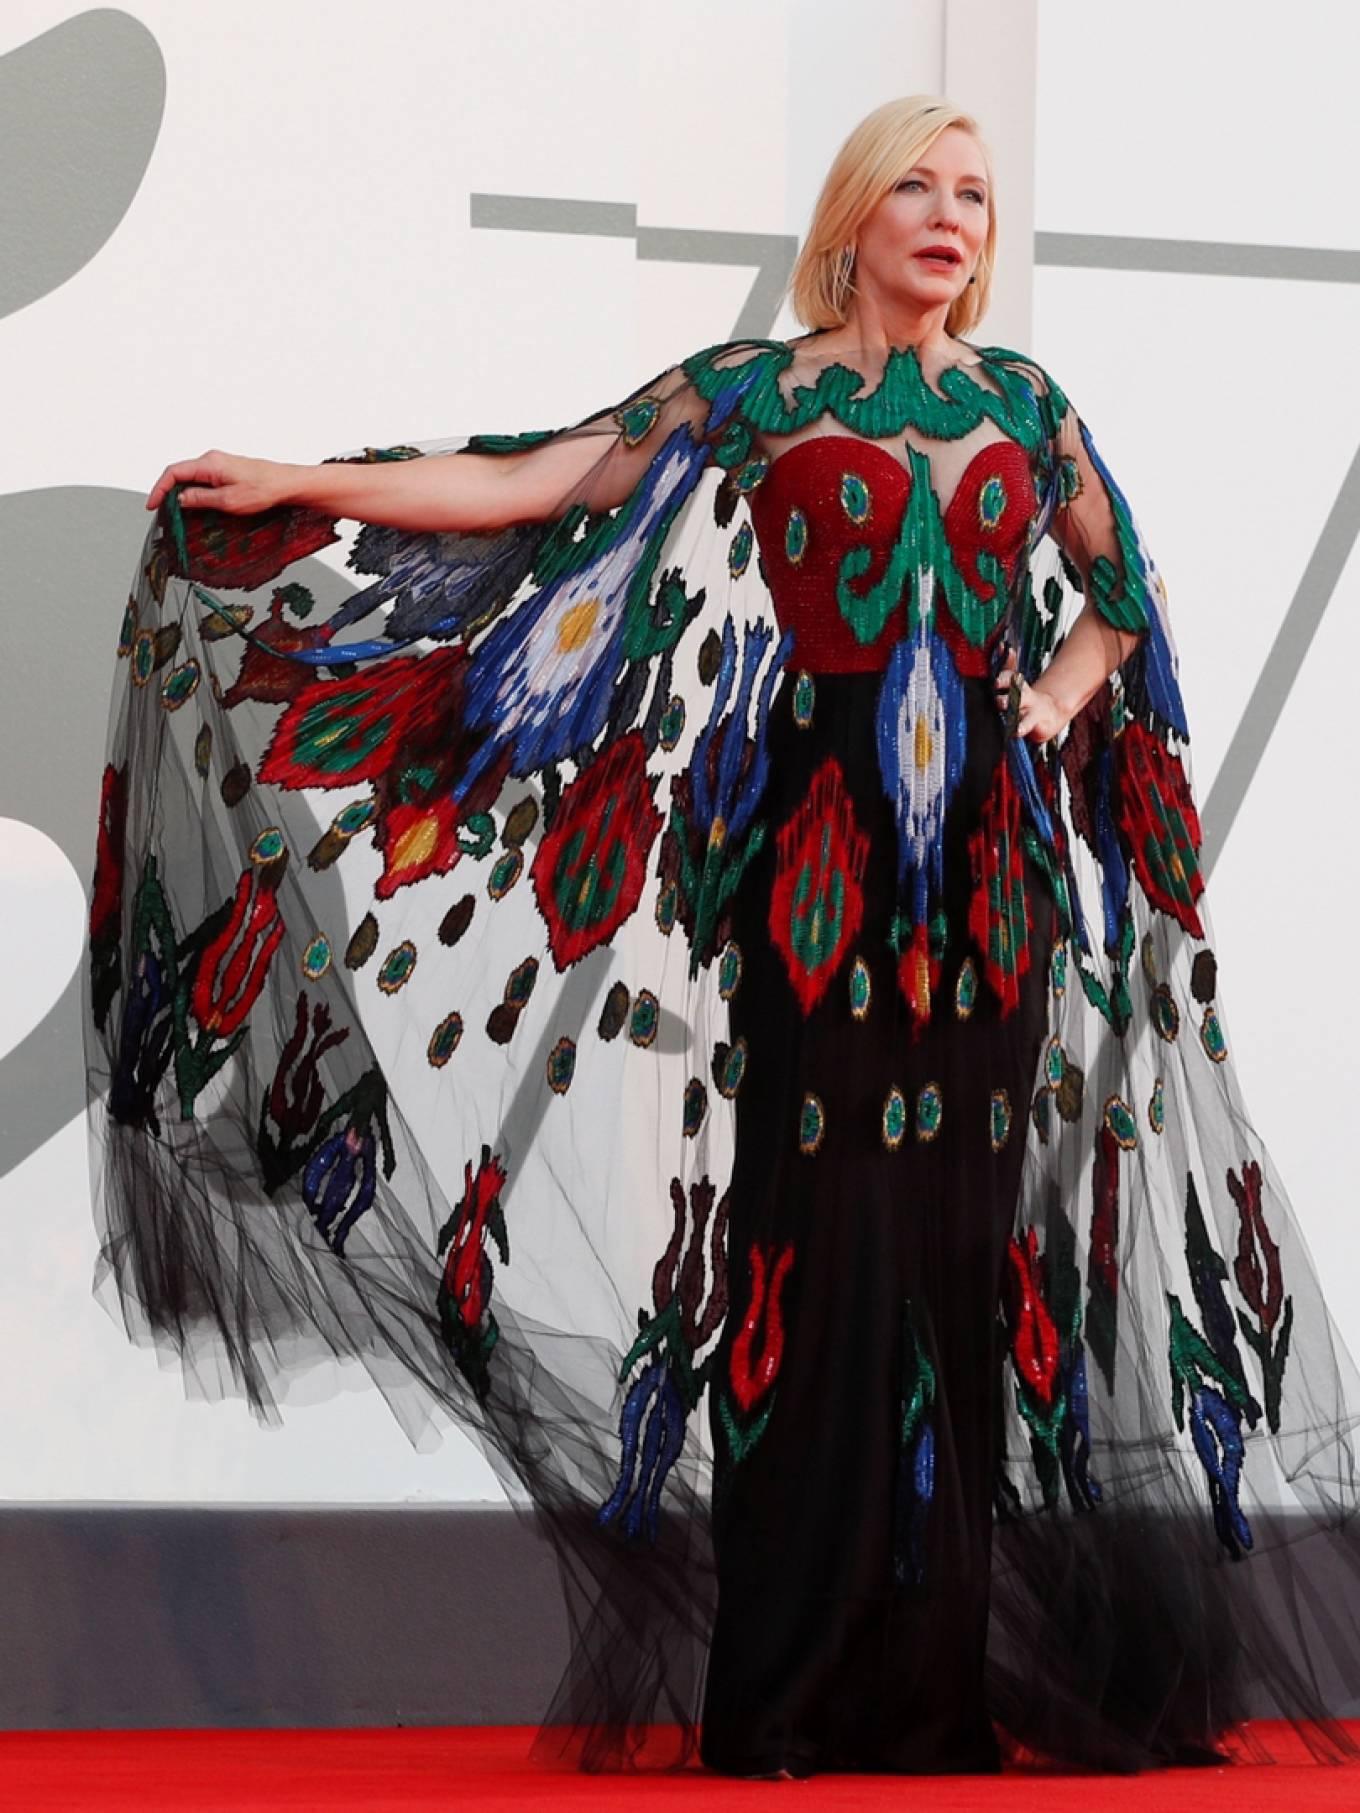 Cate Blanchett 2020 : Cate Blanchett – Closing Ceremony Red Carpet of 2020 Venice Film Festival in Venice-04